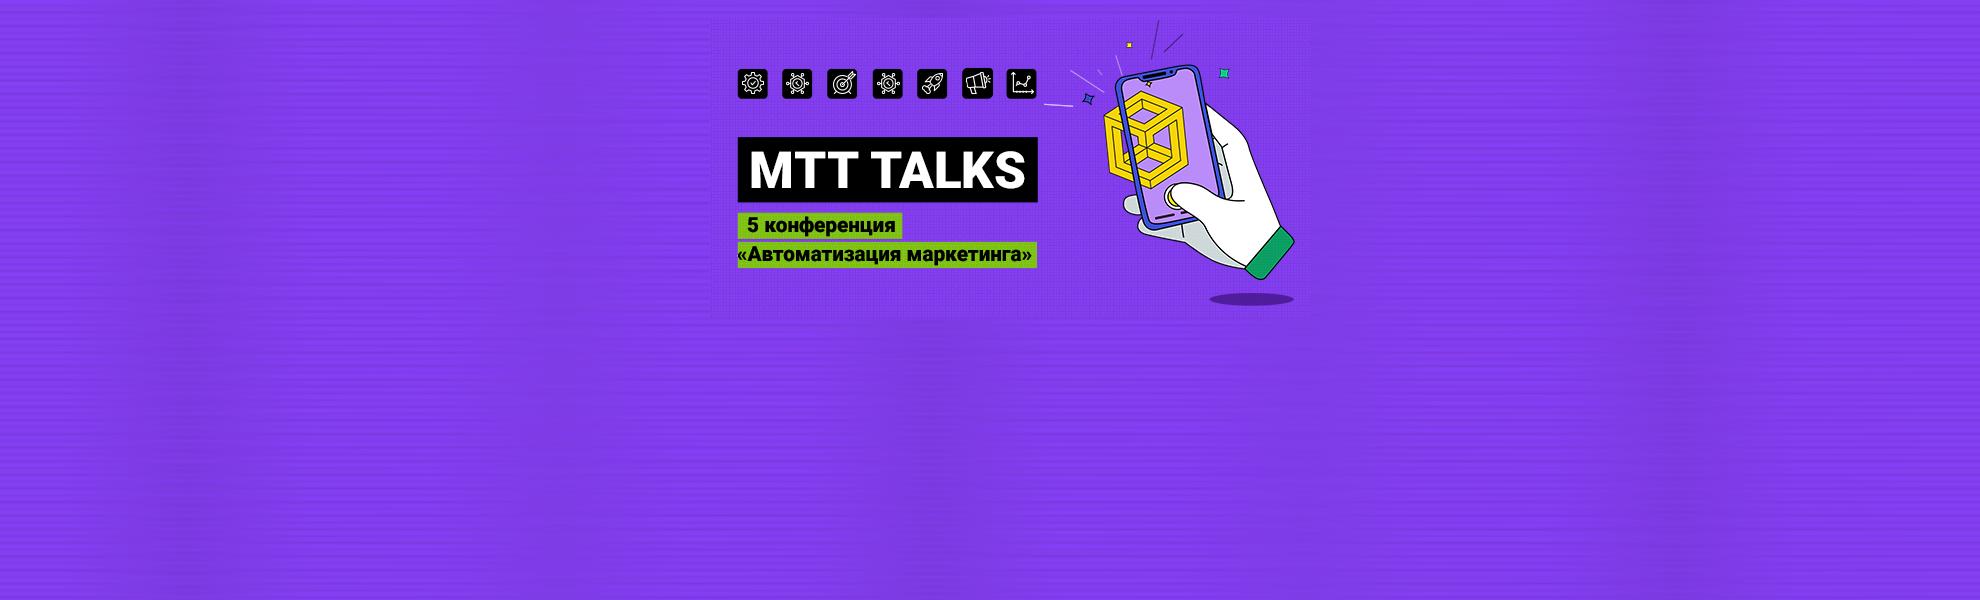 MTT Talks – пятая конференция «Автоматизация маркетинга» перенесена на июнь.